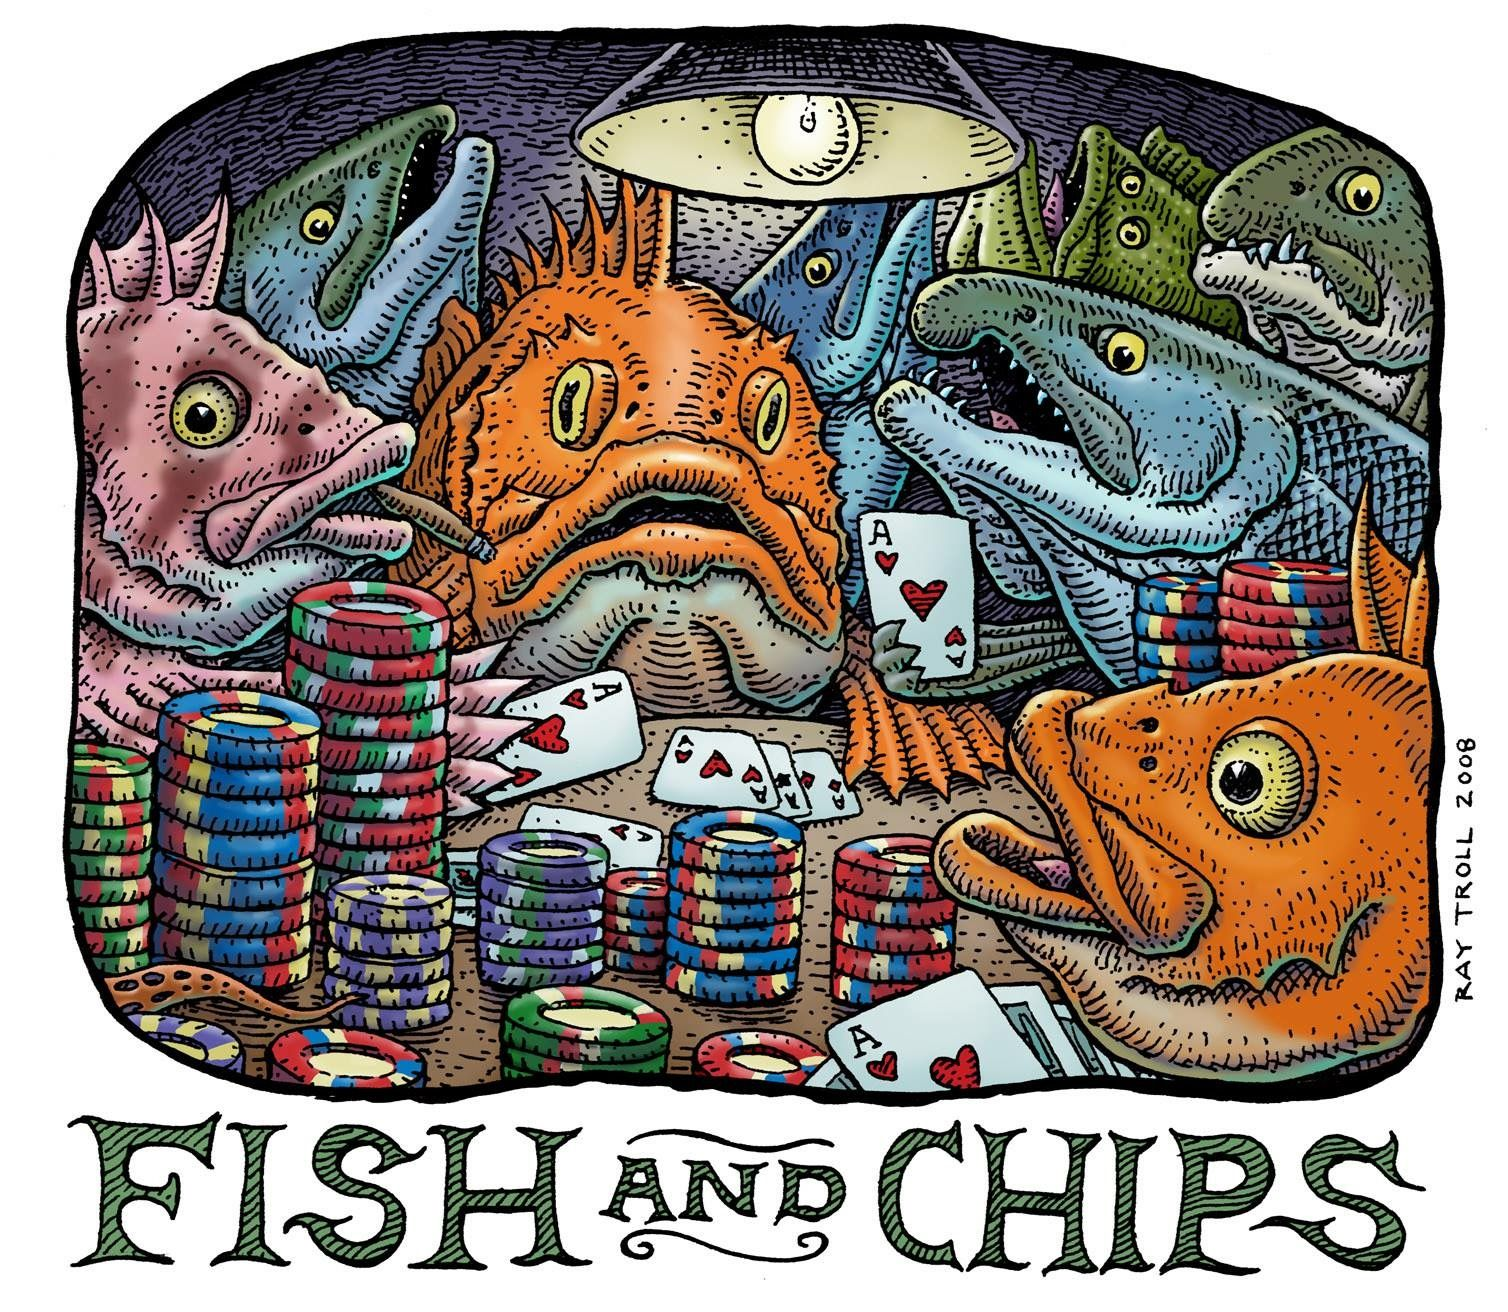 Pin by Сергей Абсалямов on Art Three Fish and chips